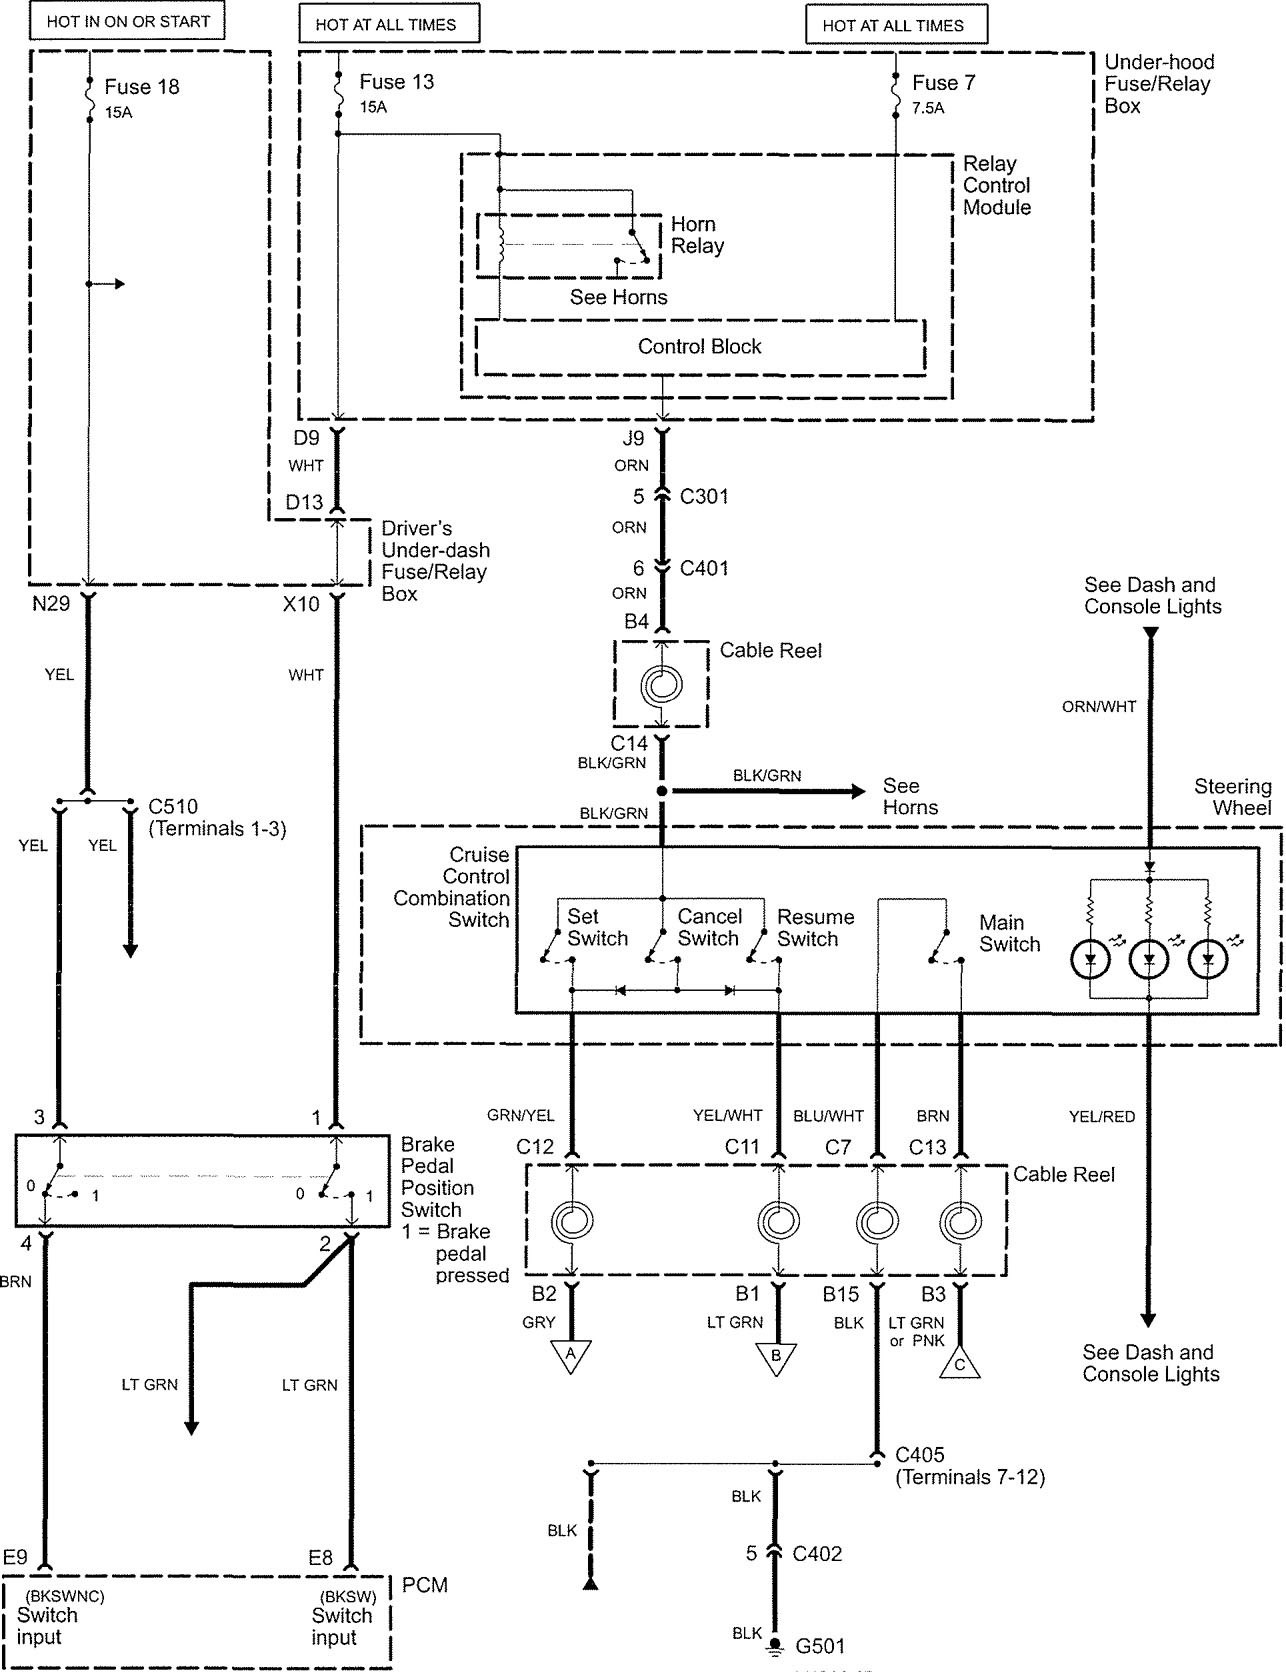 07 pontiac g6 stereo wiring diagram iota i 24 emergency ballast solstice radio buick lucerne